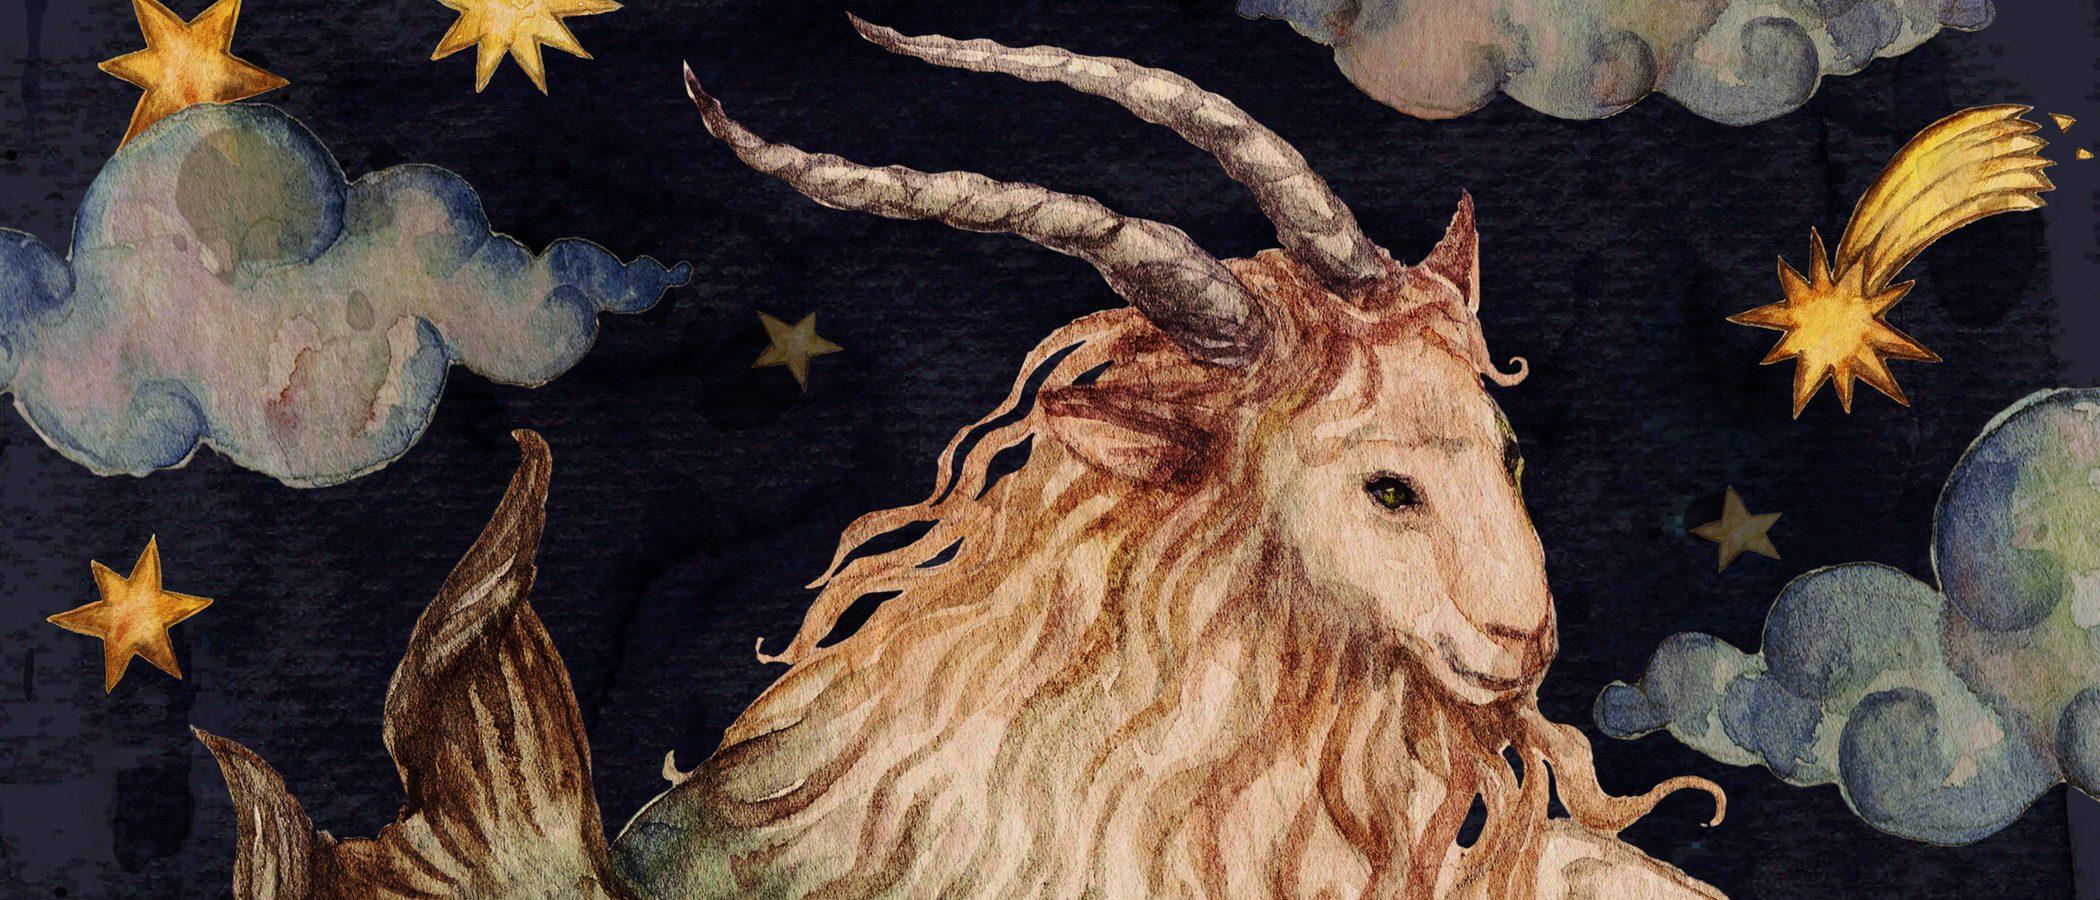 Horóscopo febrero 2018: Capricornio